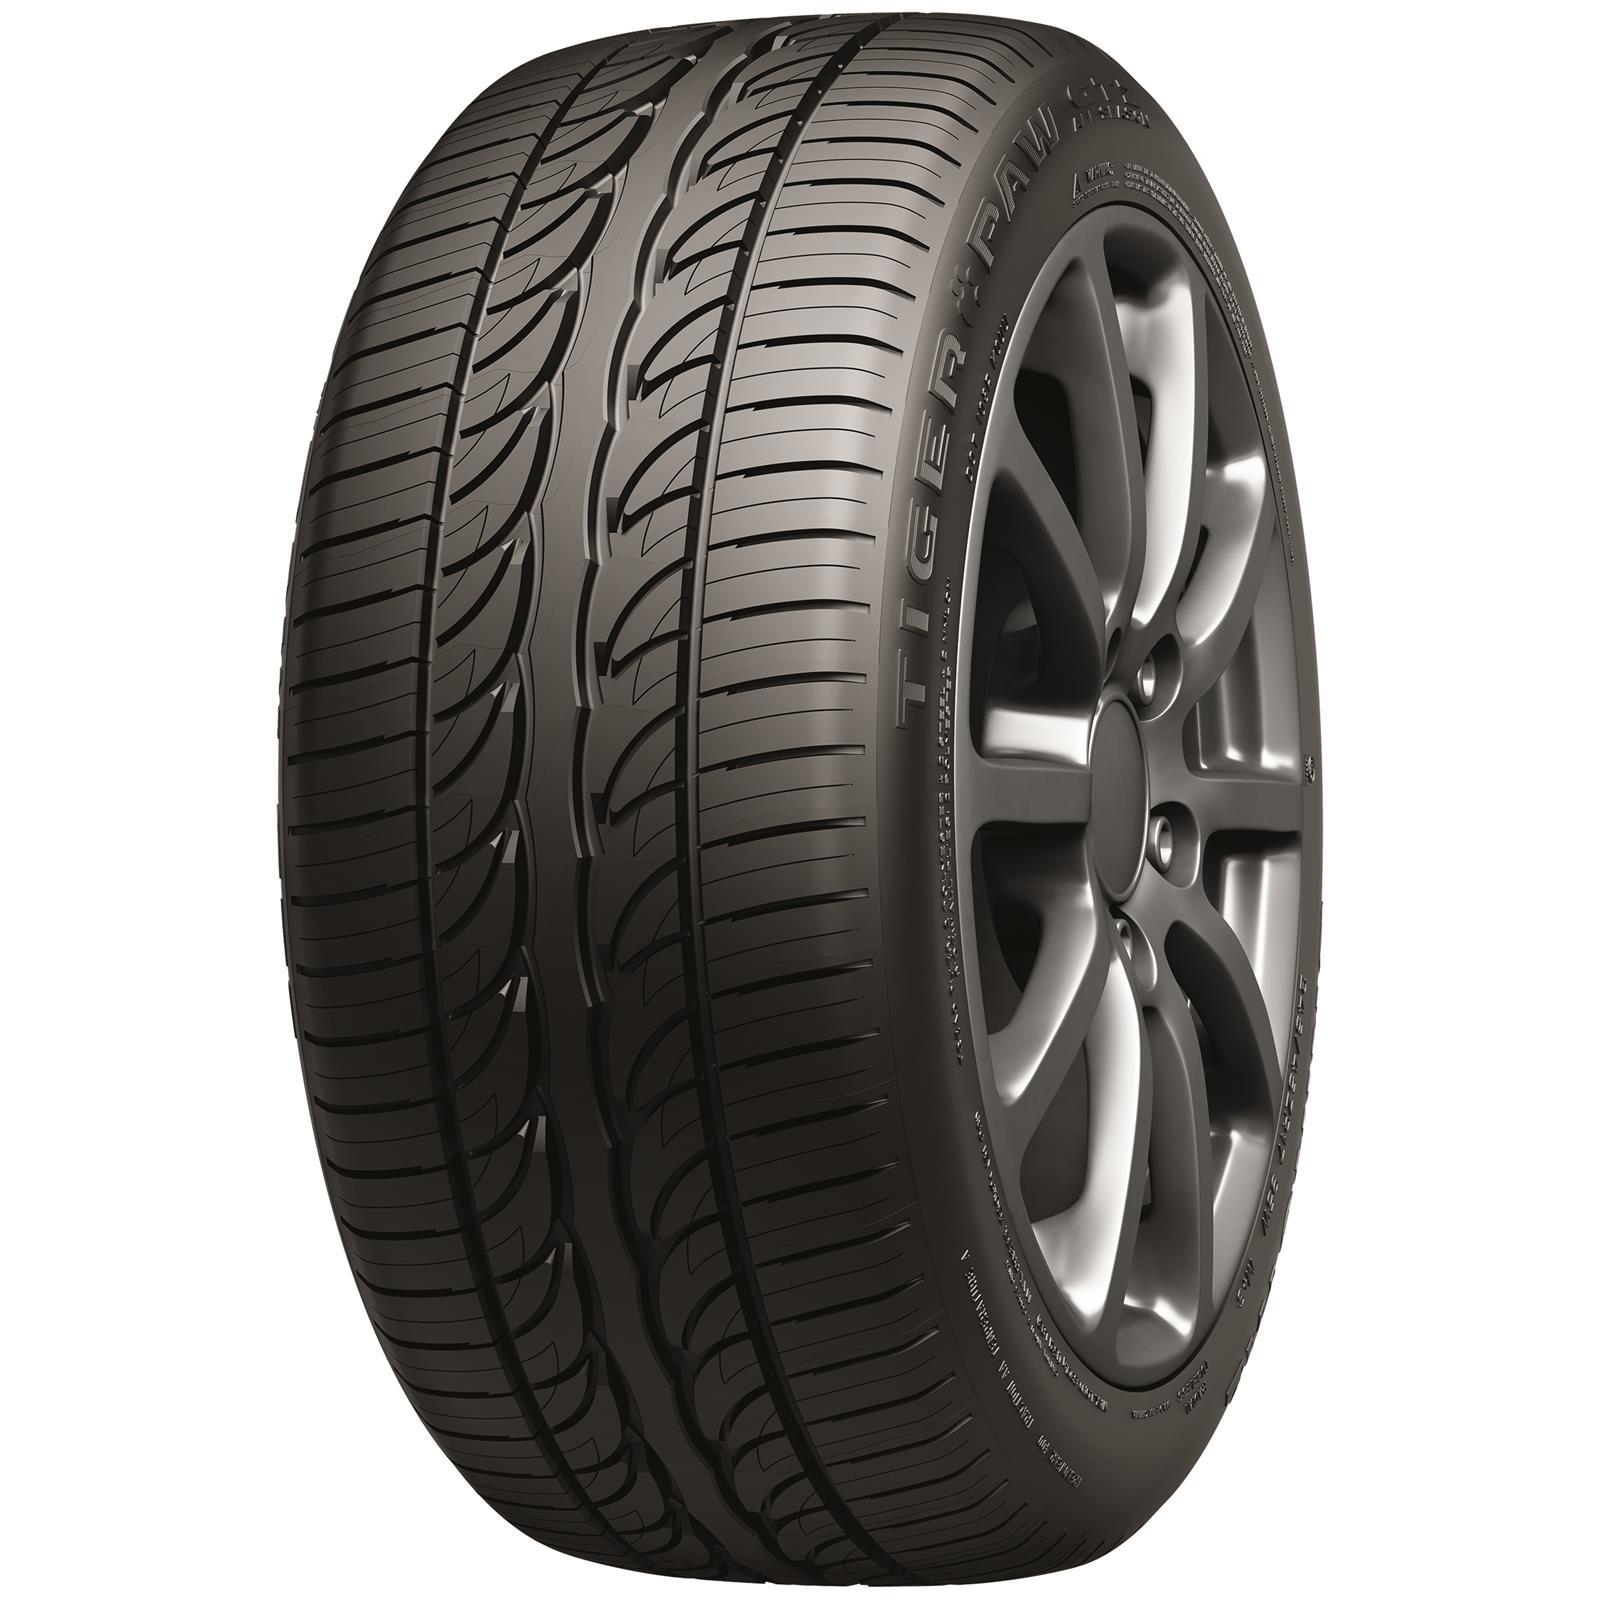 All Season Tires >> Uniroyal Tiger Paw Gtz All Season Tires 34594 Free Shipping On